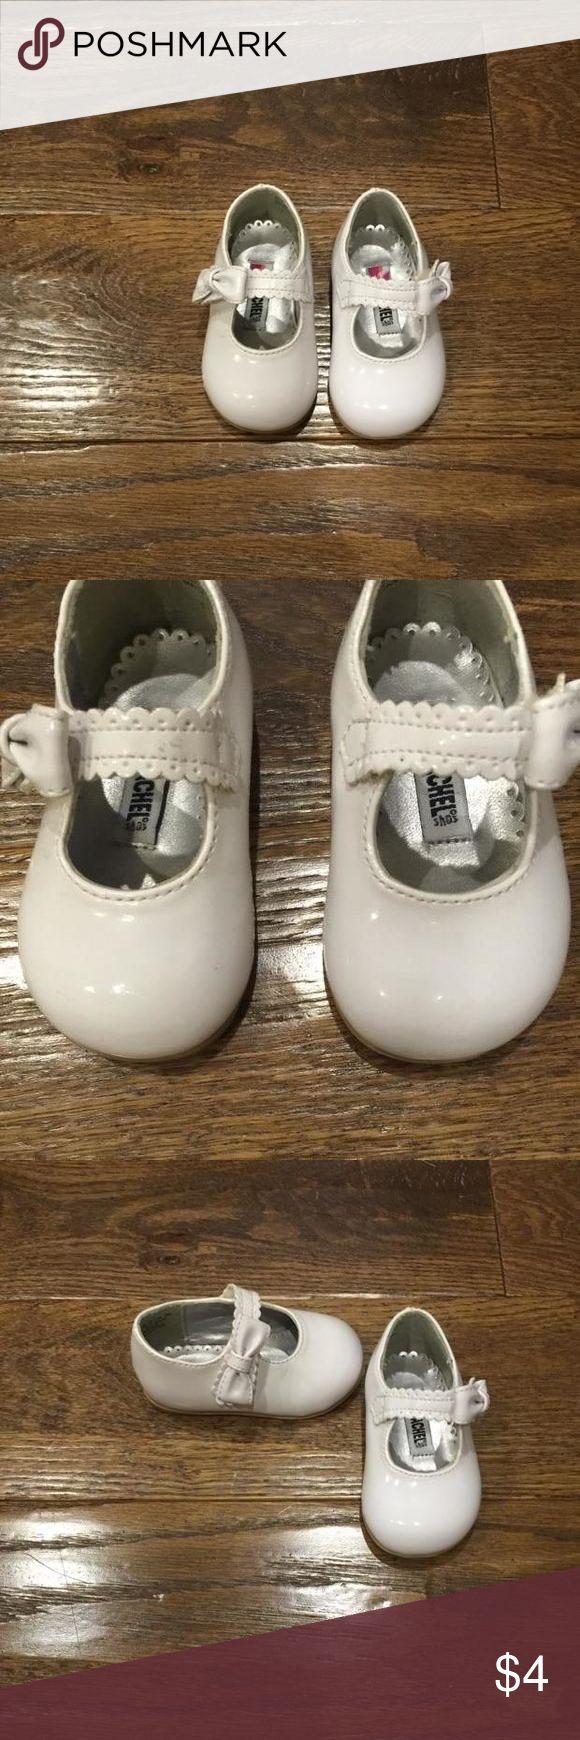 Rachel Shoes Rachel Shoes • white patten leather • small scuffs on front of shoe • worn once by non-walker Rachel Shoes Dress Shoes